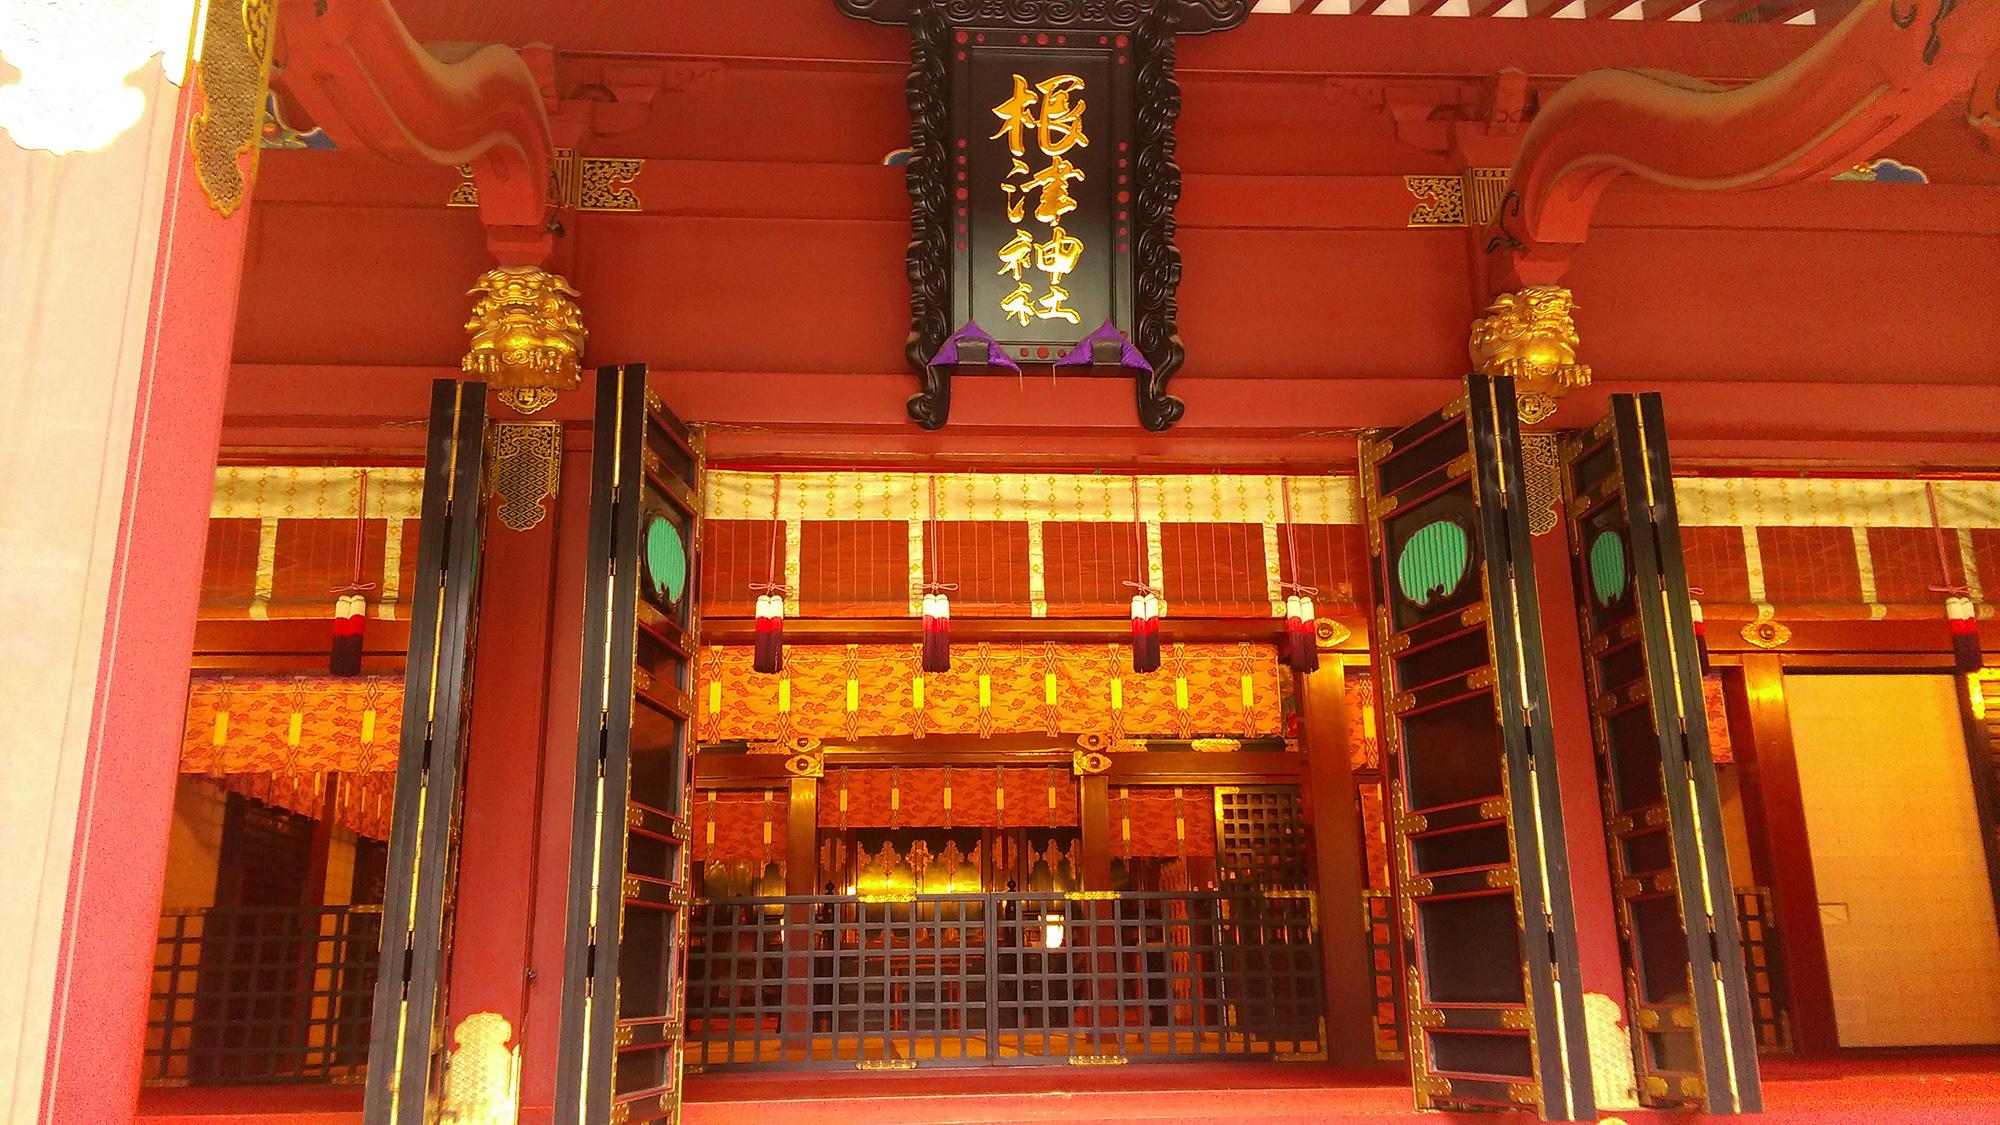 【神社仏閣/Temple&Shrine】根津神社☆